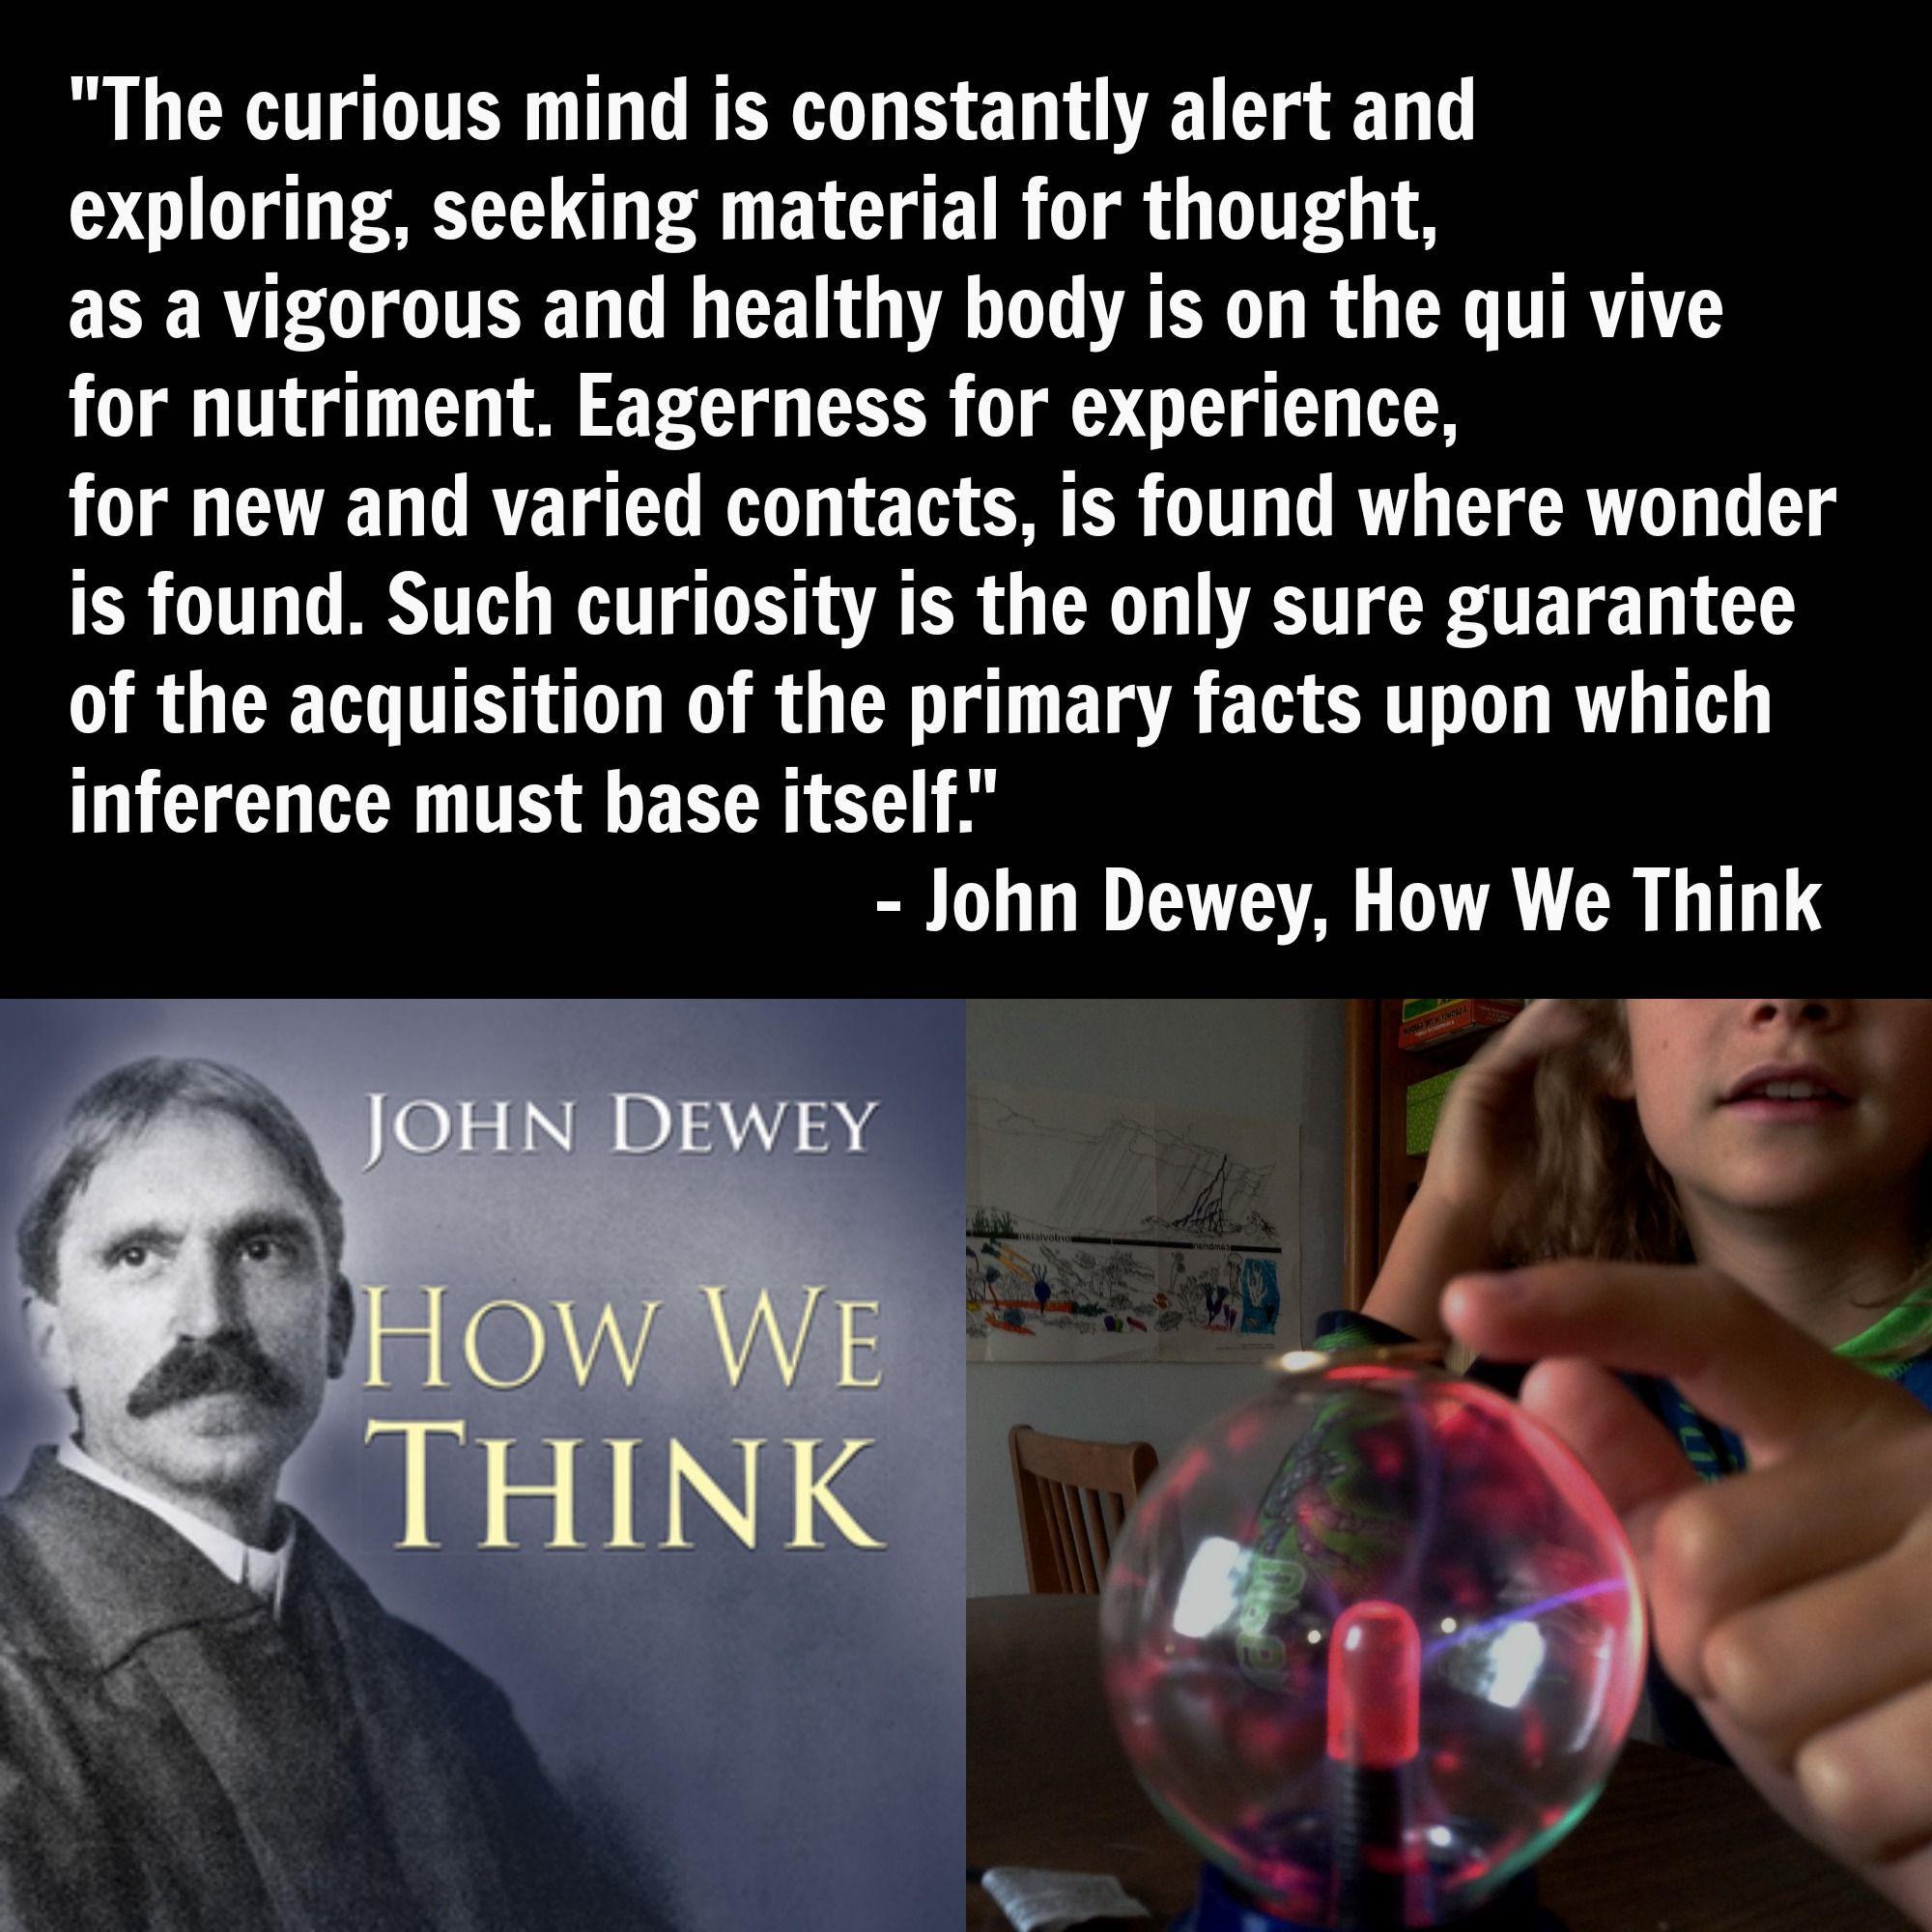 John Dewey Quotes On Education  john dewey education quotes Google Search